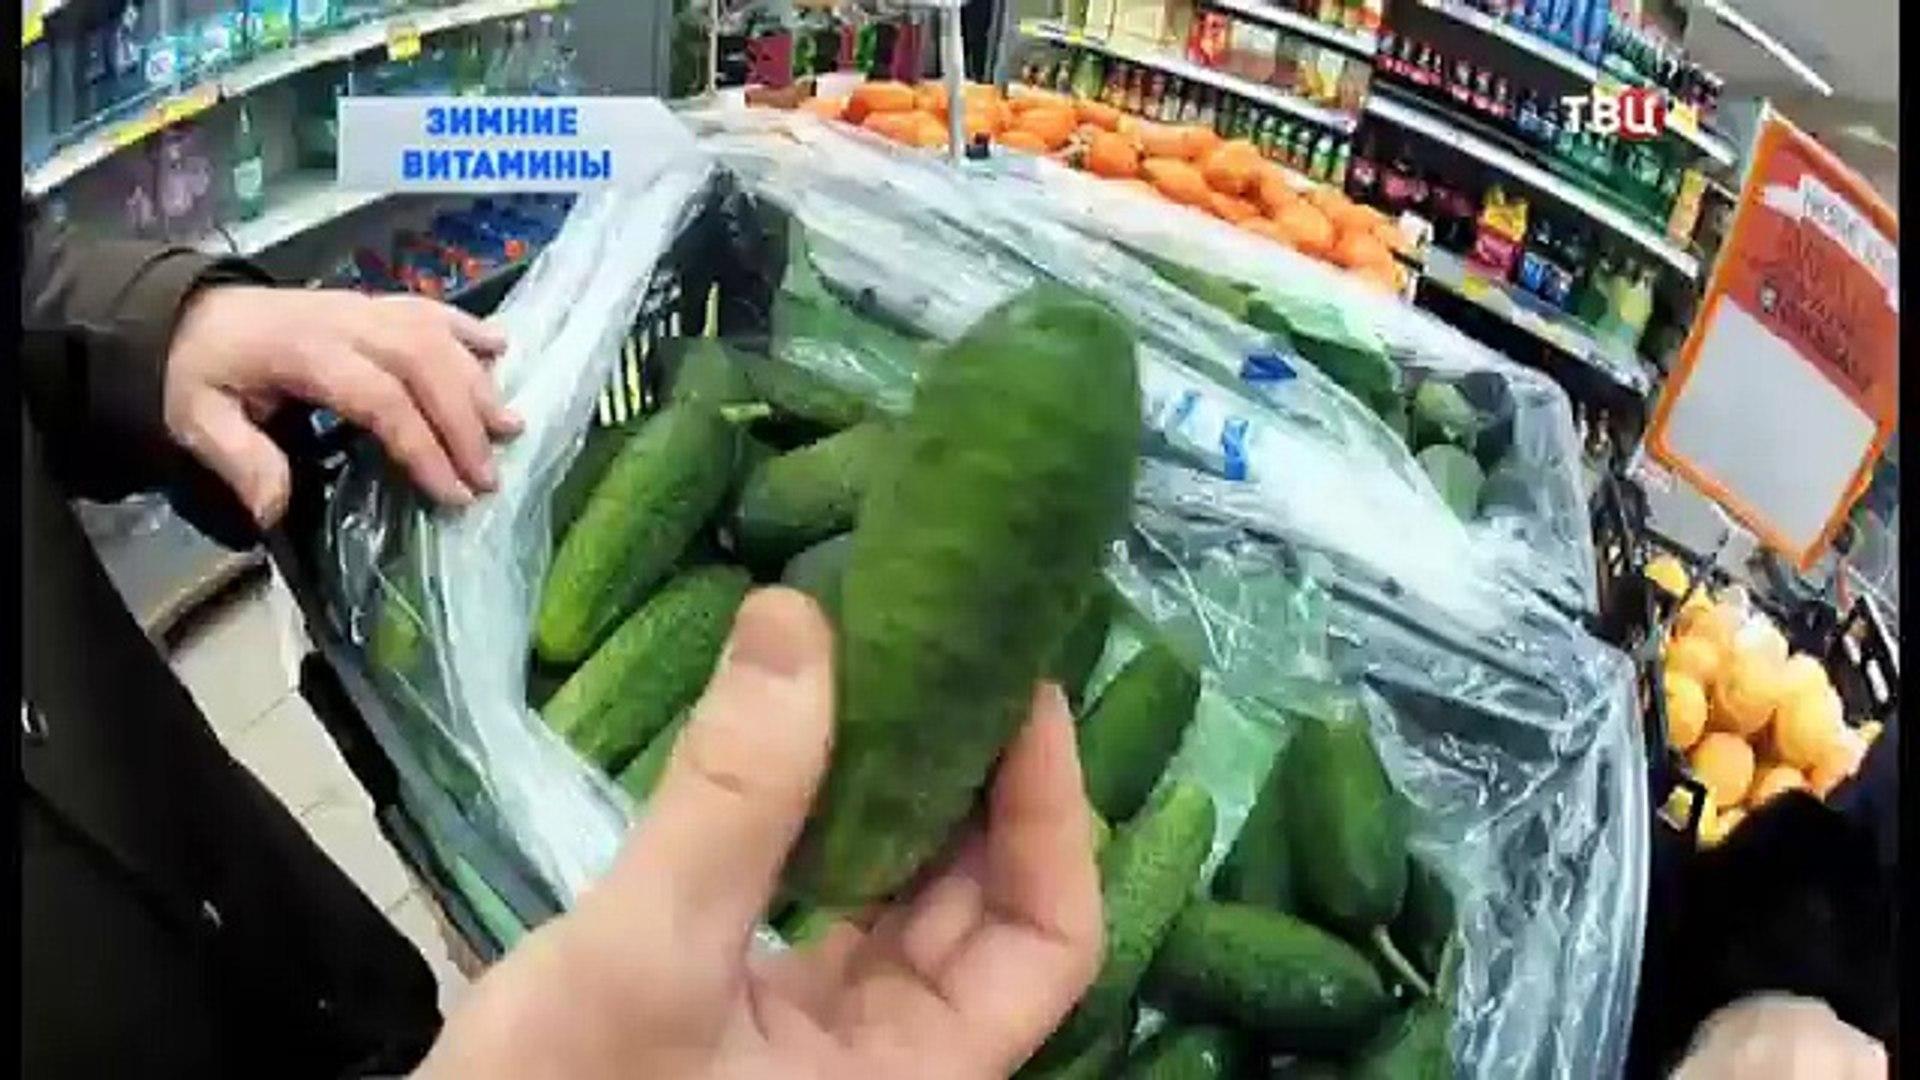 Зимние витамины. Овощи. Без обмана